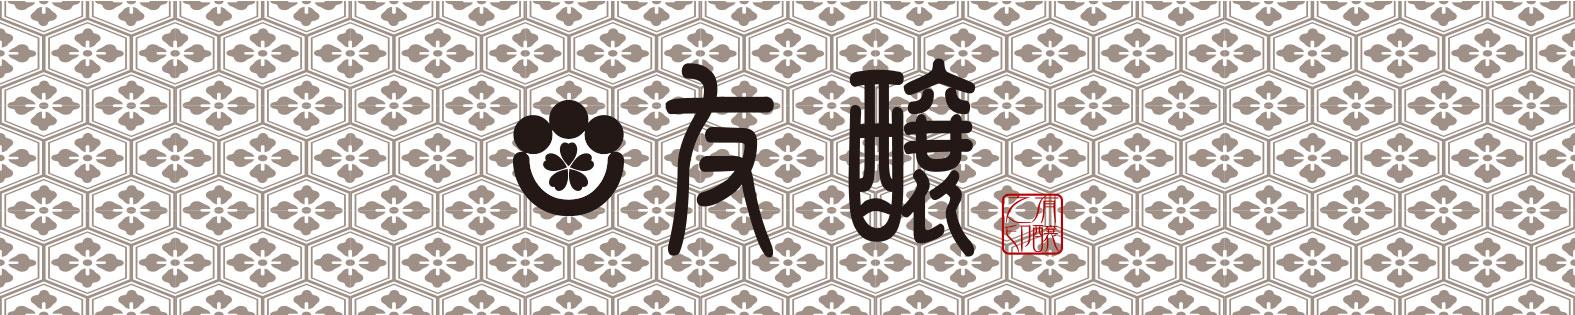 【日本酒】楯野川 にごり本生 純米大吟醸 山田錦50 限定 新酒26BY_e0173738_9495984.jpg